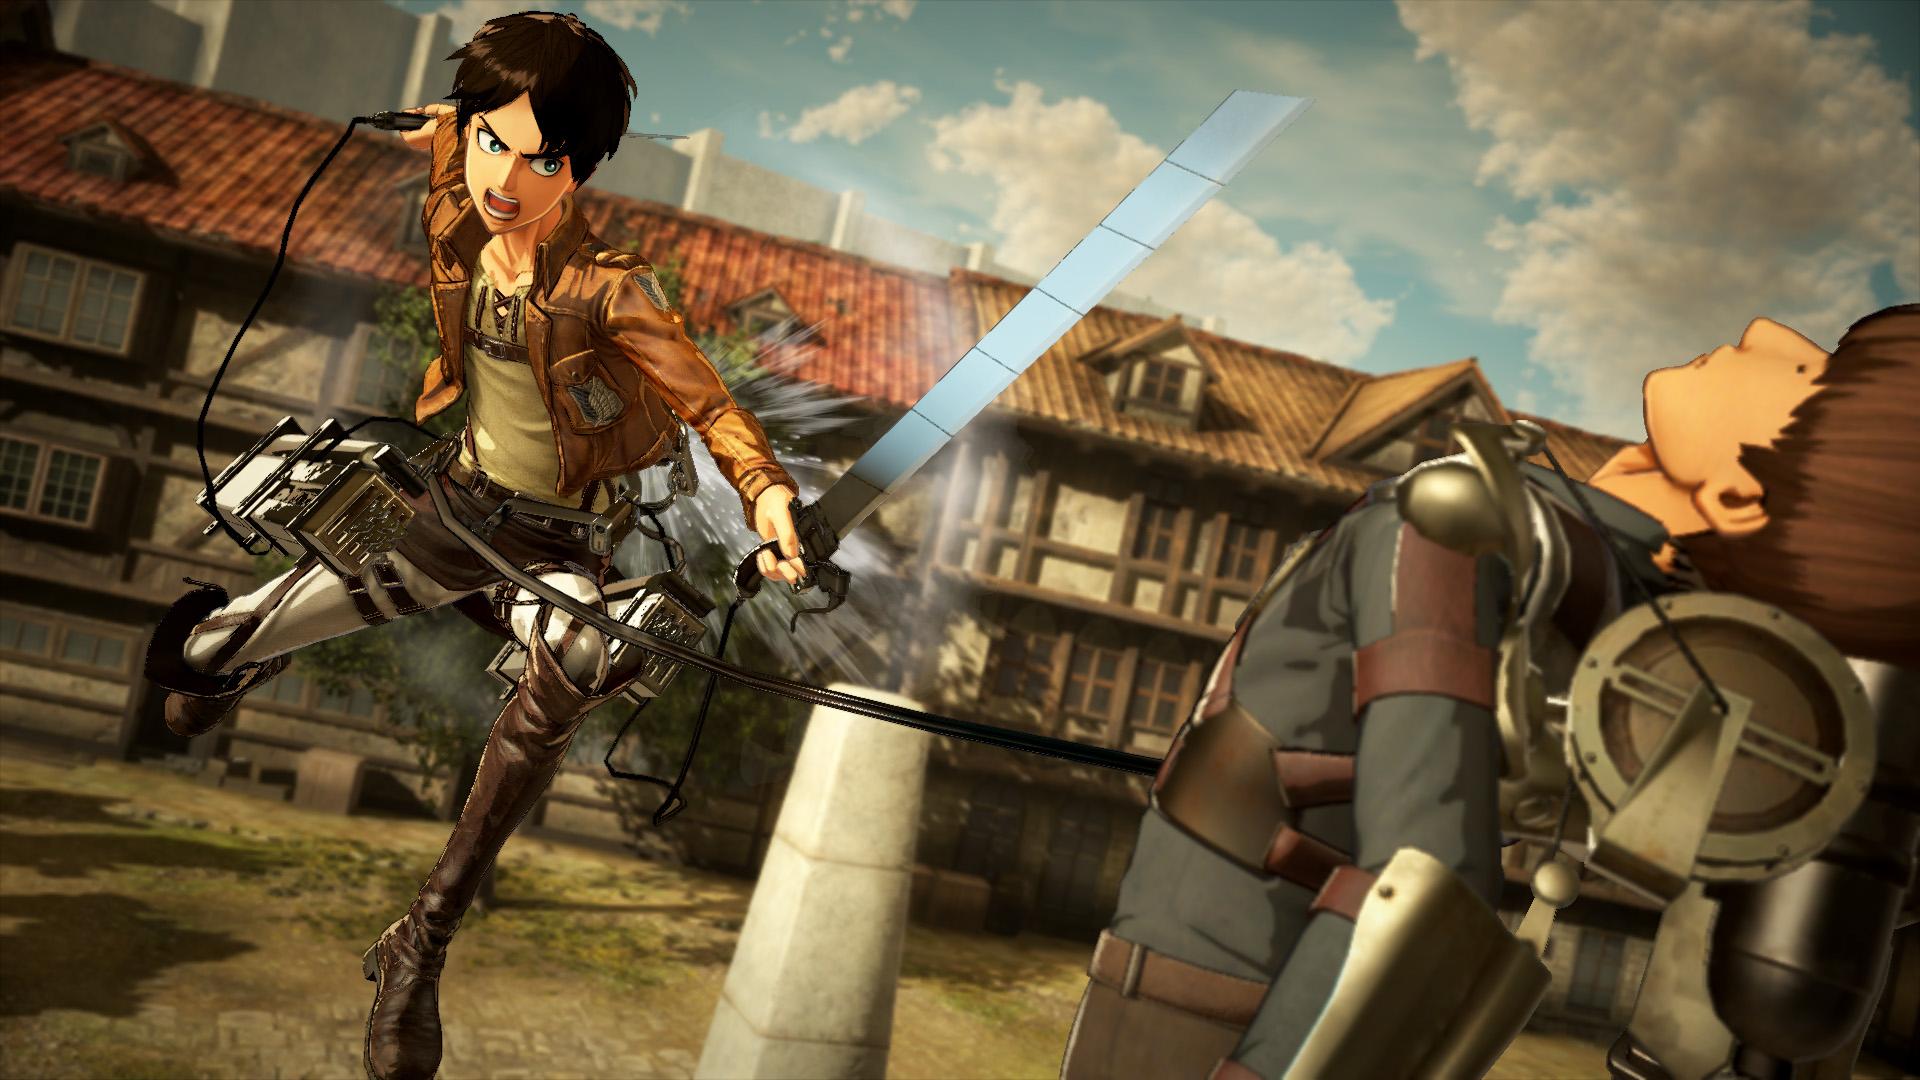 Attack On Titan 2: Final Battle Review - Noch einmal in den Kampf